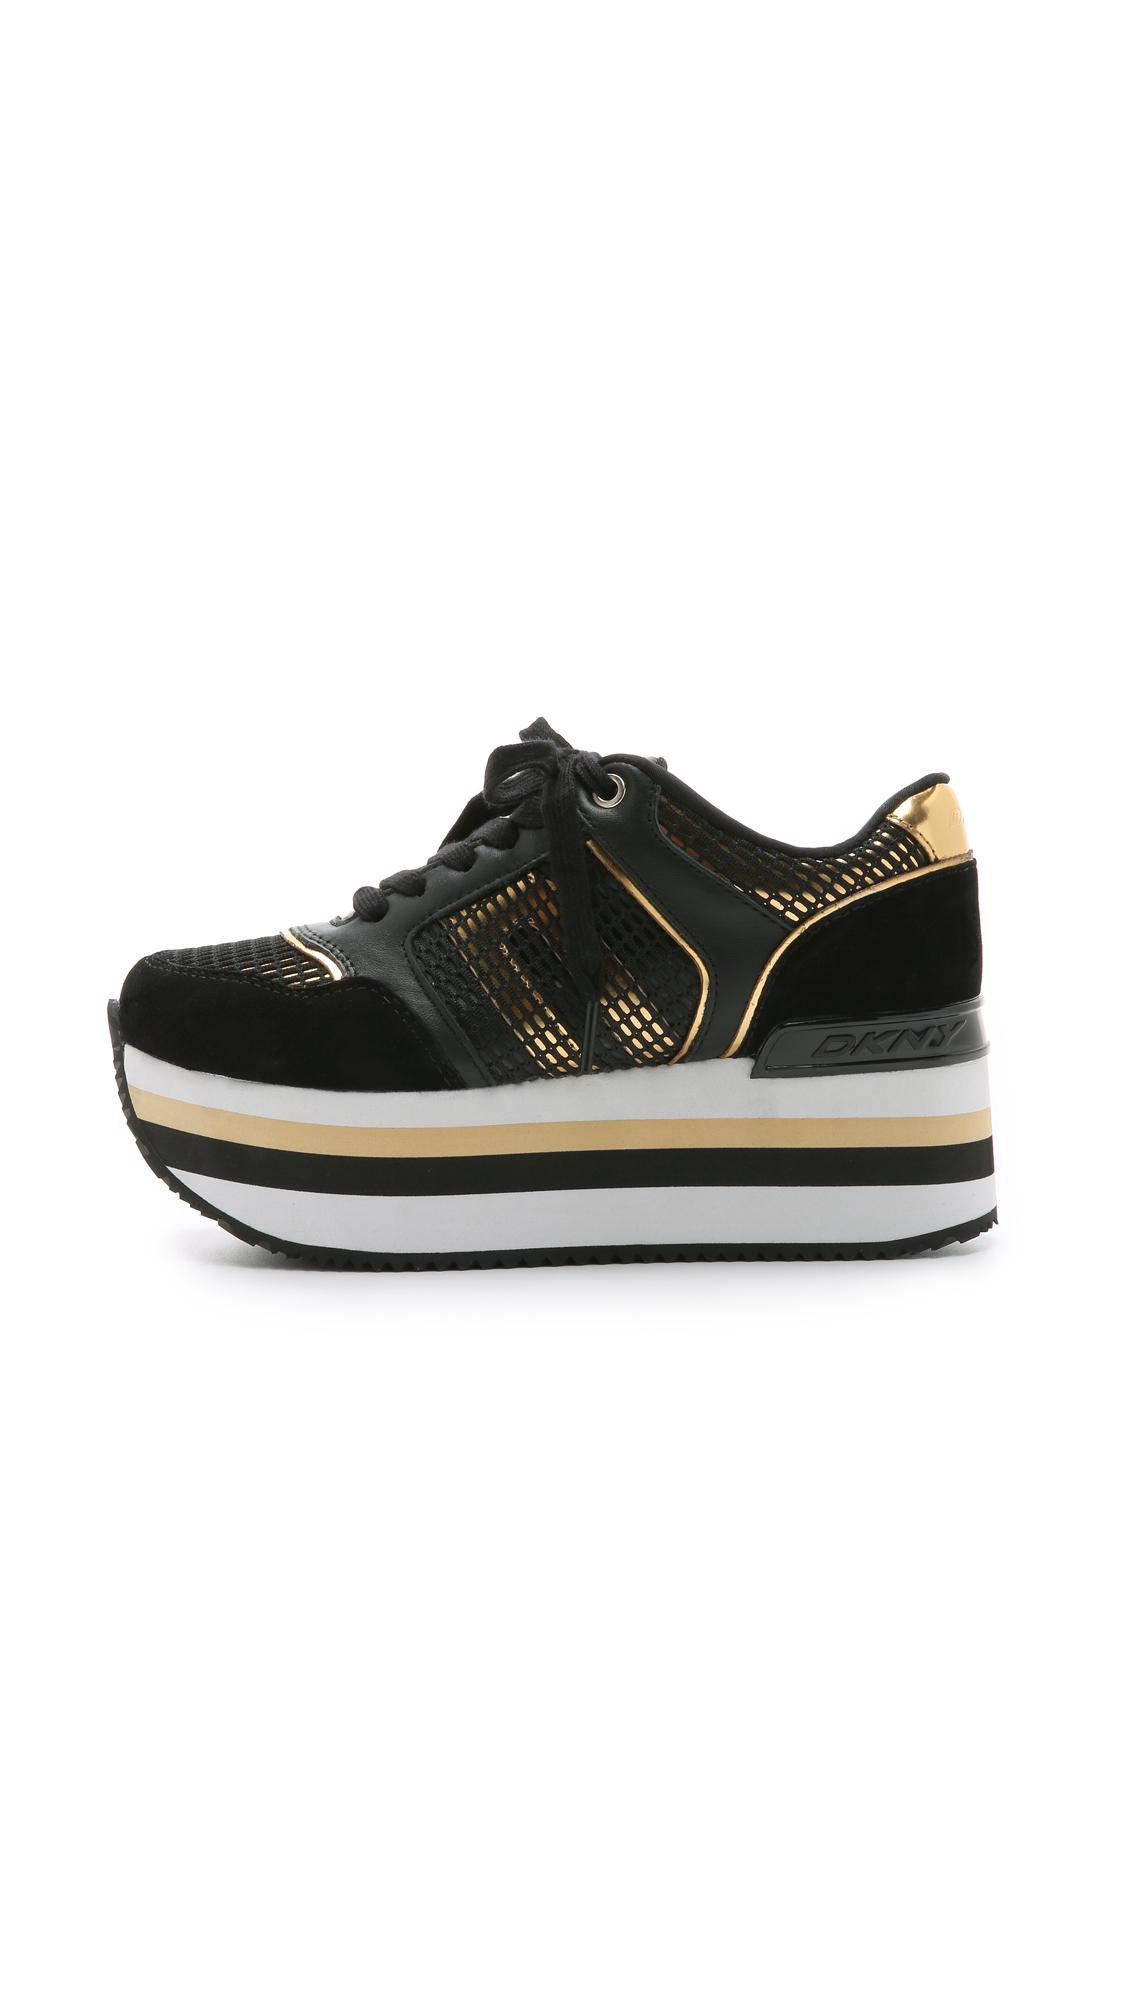 Dkny Black Shoes